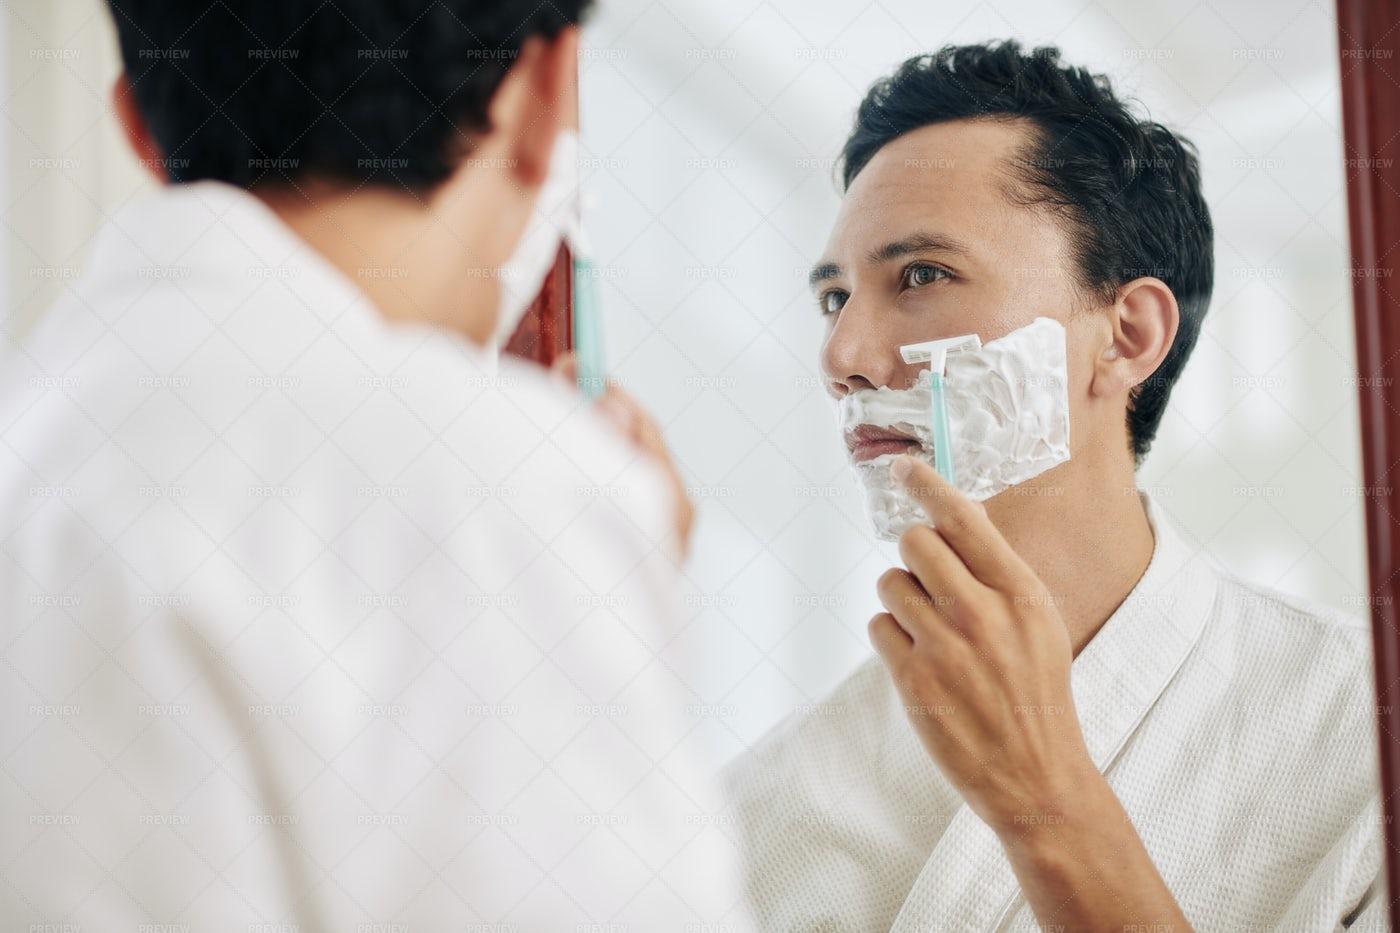 Man Shaving At Bathroom Mirror: Stock Photos